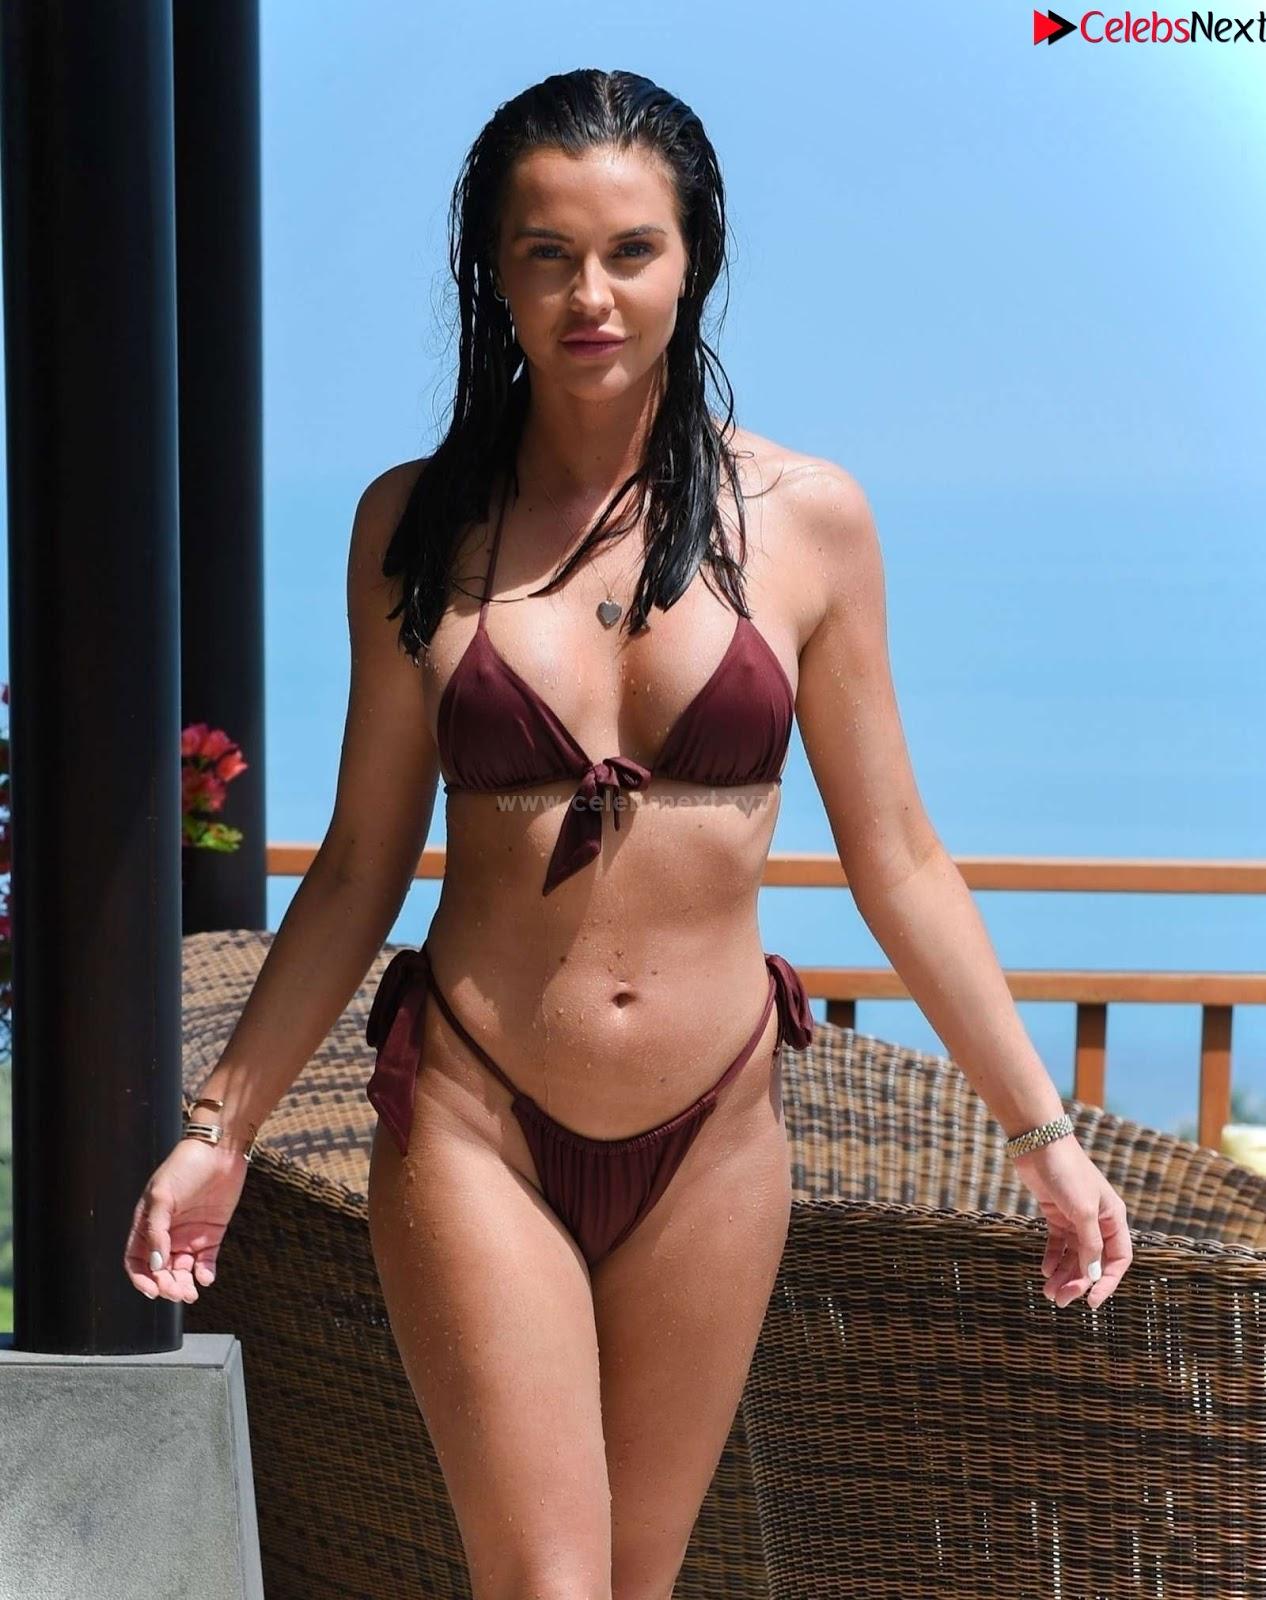 Shelby Tribble Ultra hot dusky babe tiny wet bikini thong wow Boobs pussy ass amazing